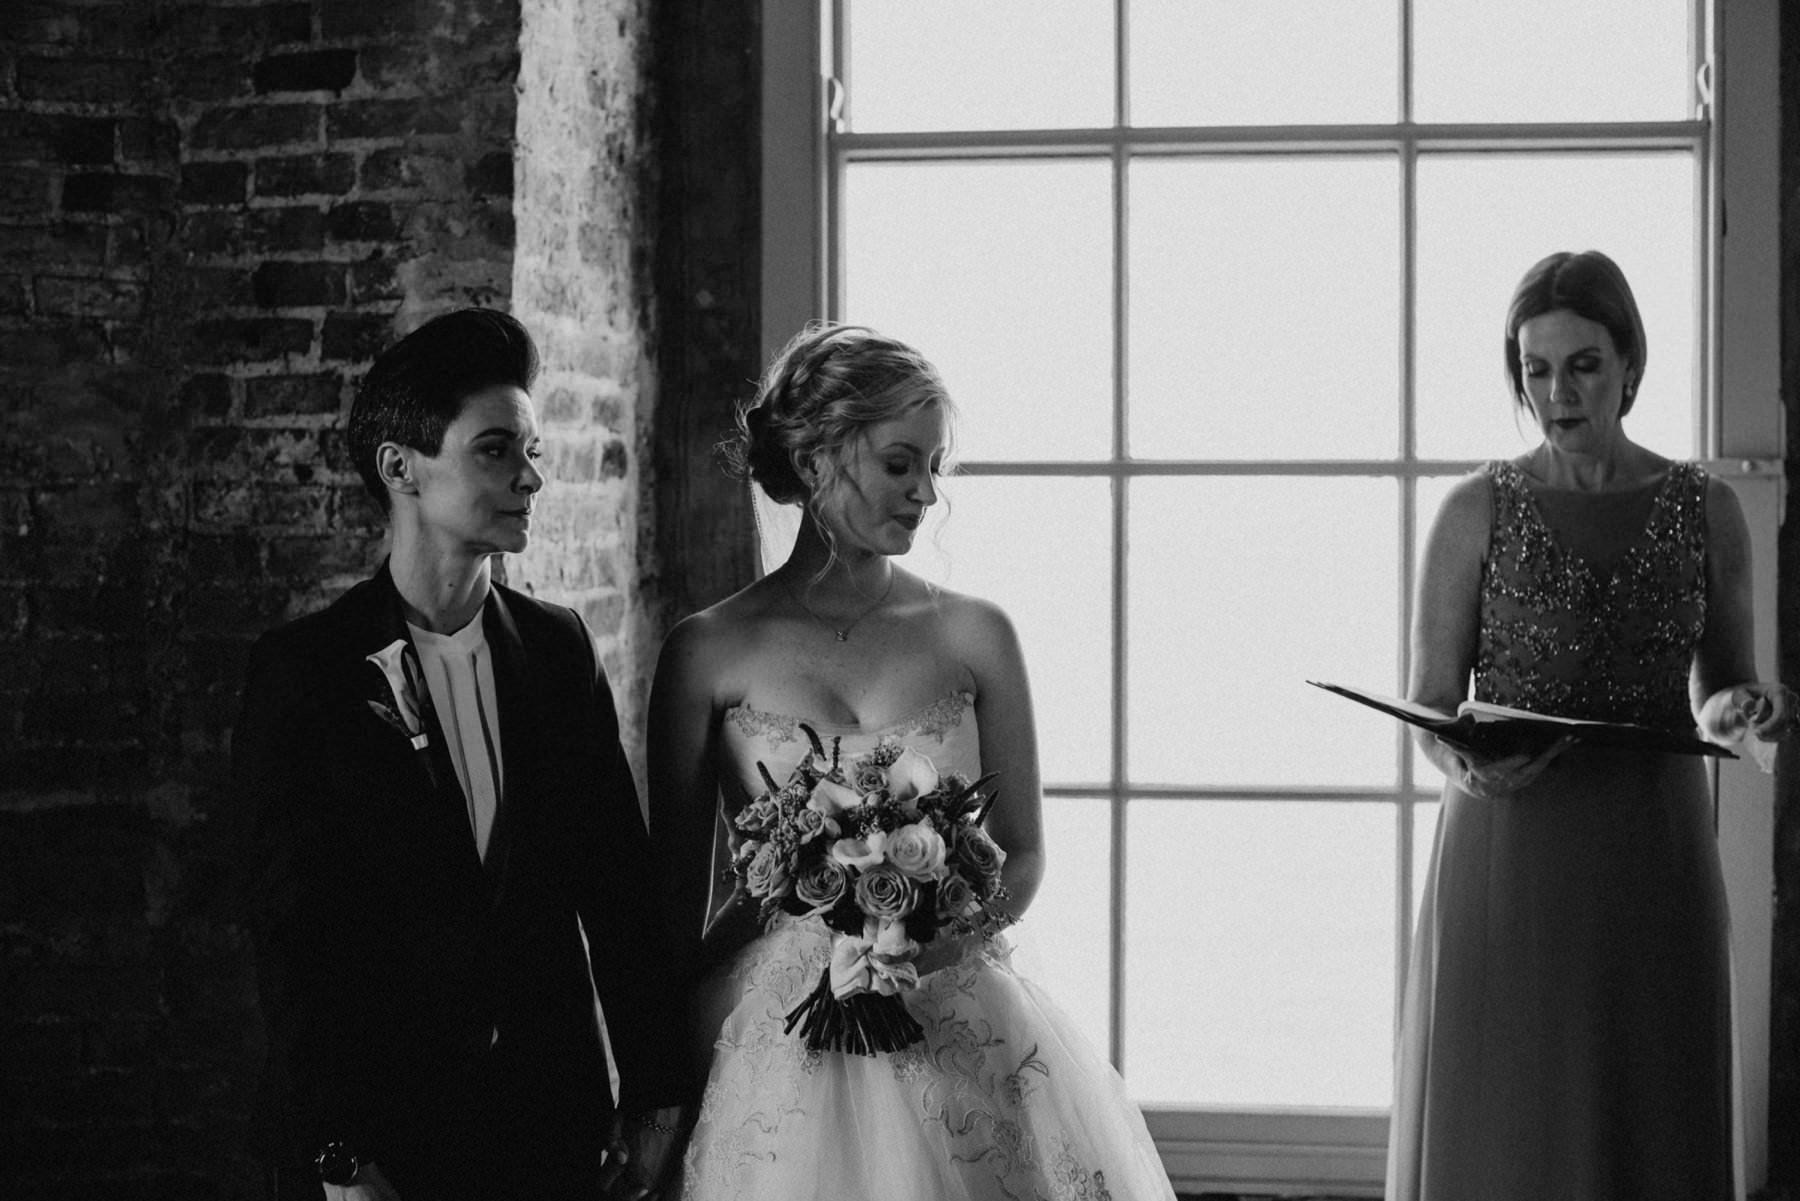 gay wedding ceremony at mussenden temple northern ireland